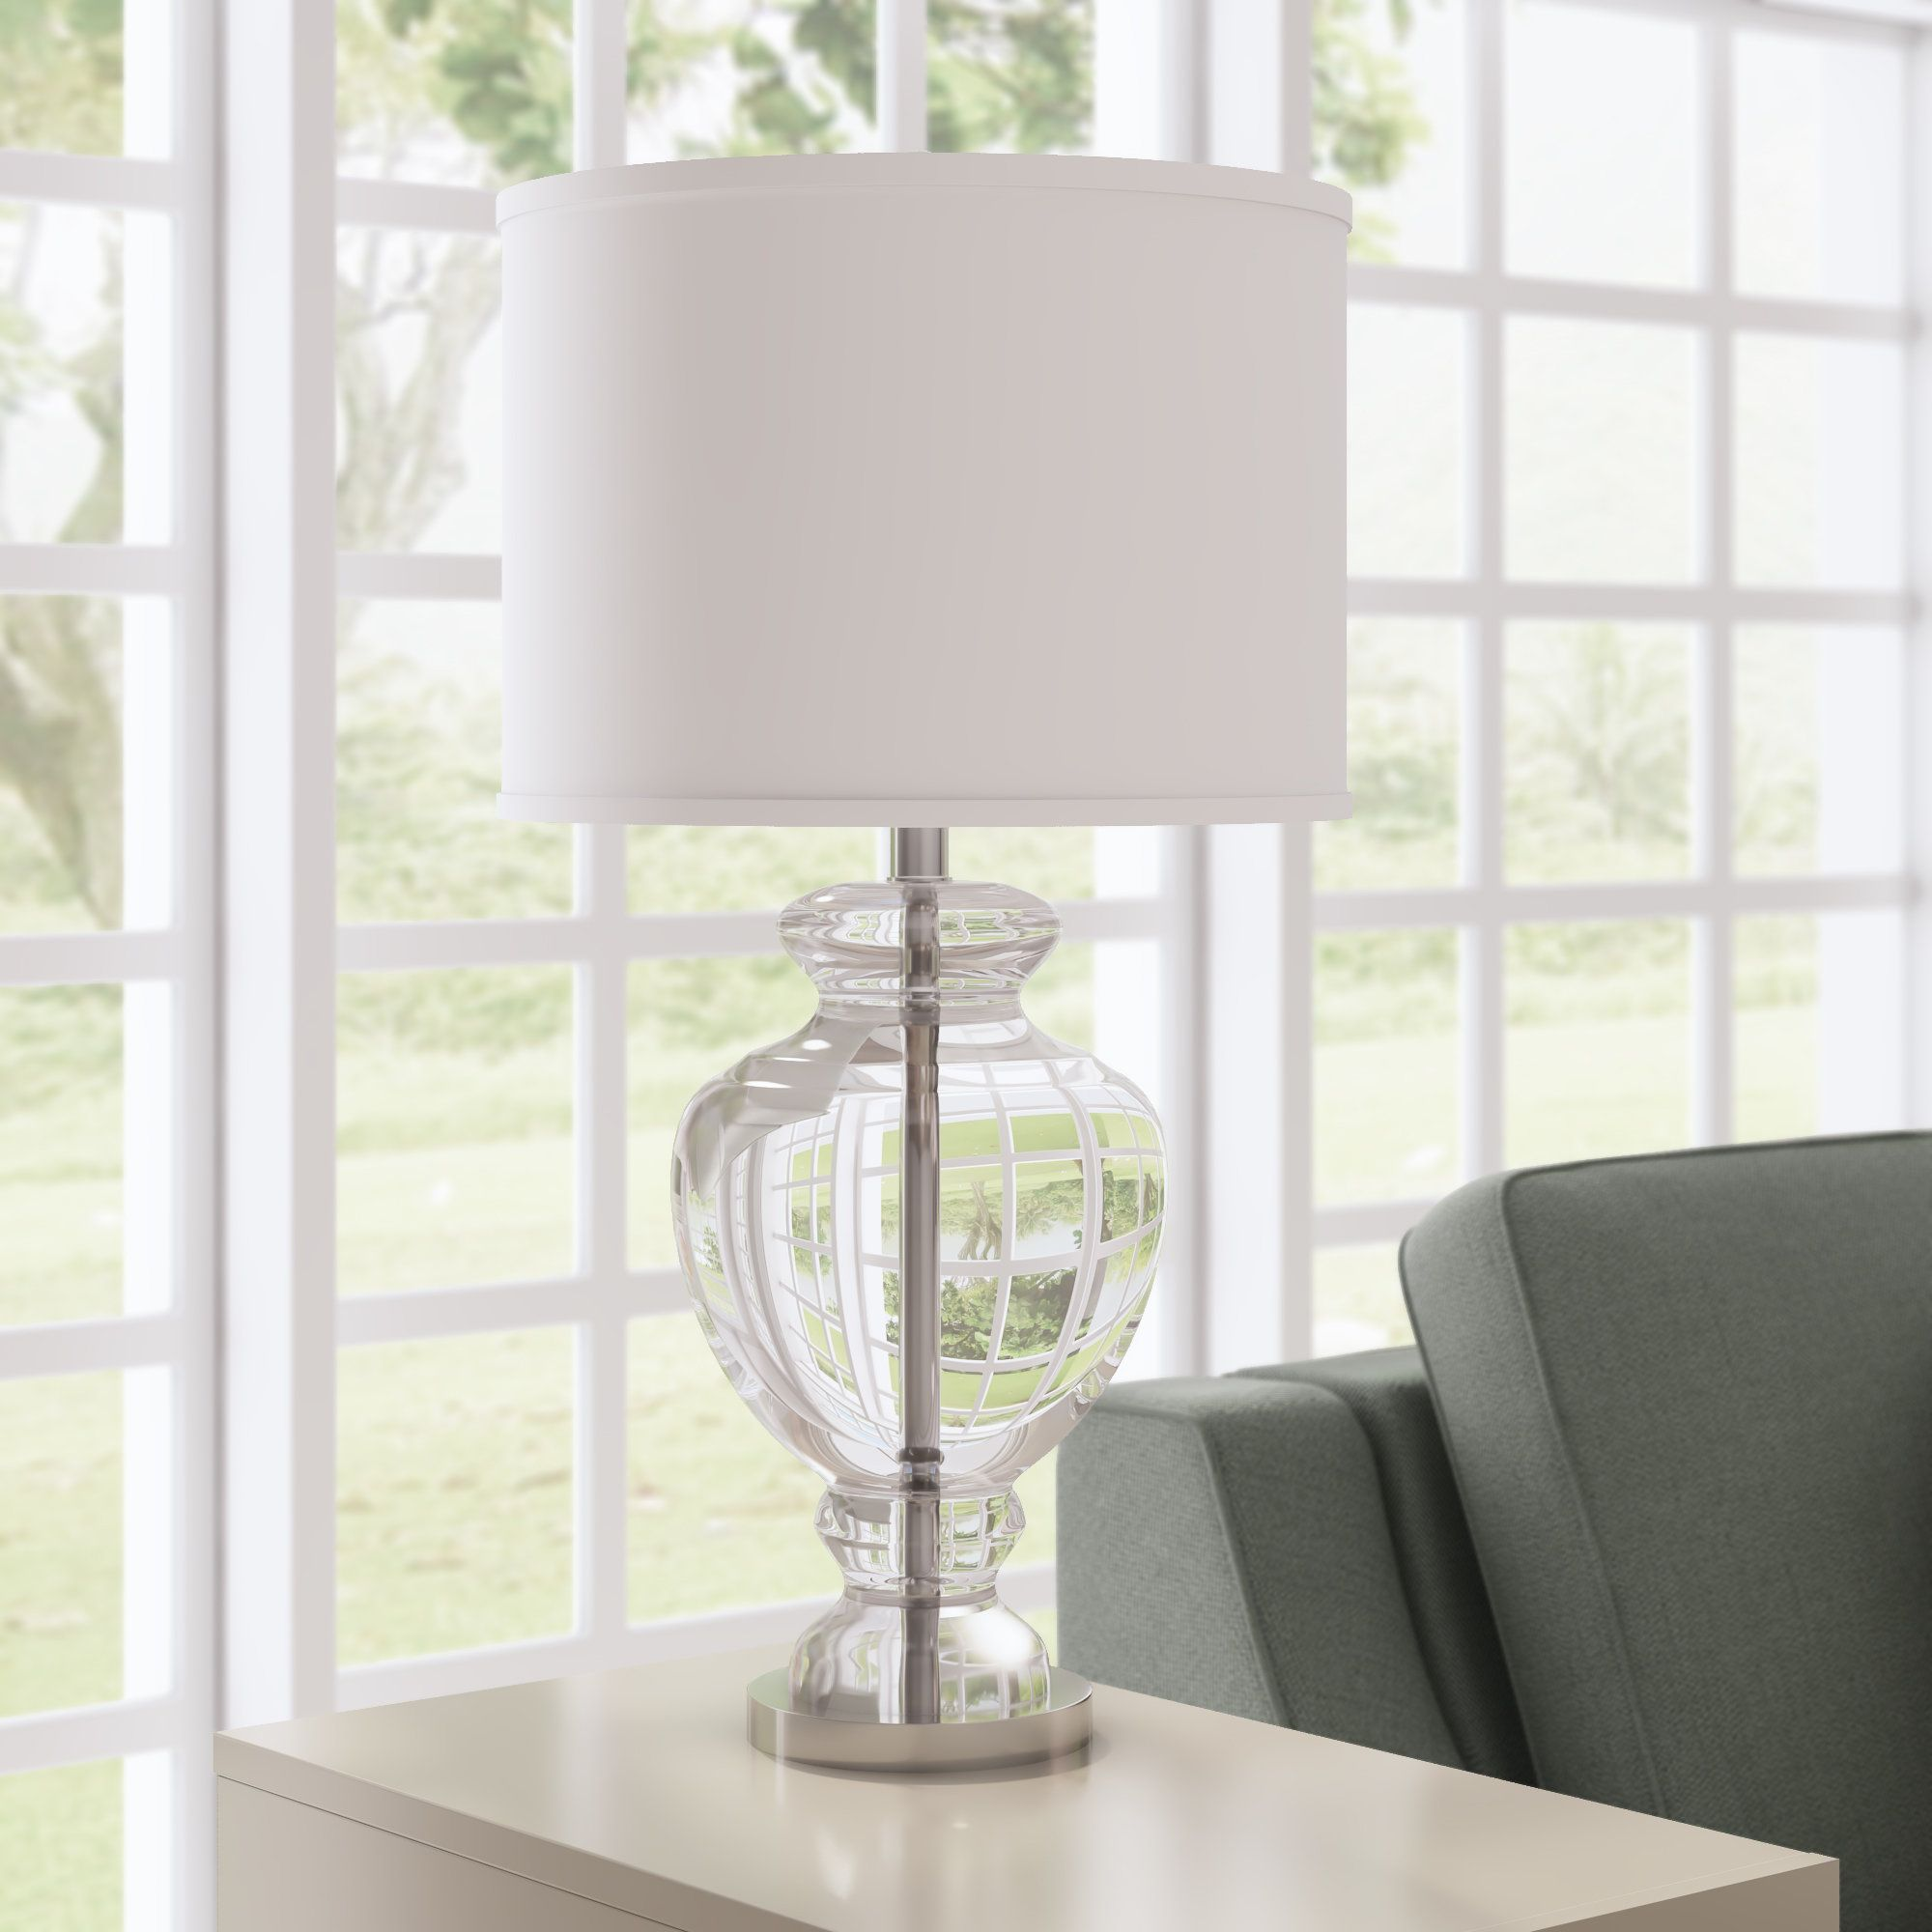 Muriel 28 Table Lamp Set | Lamp, Table